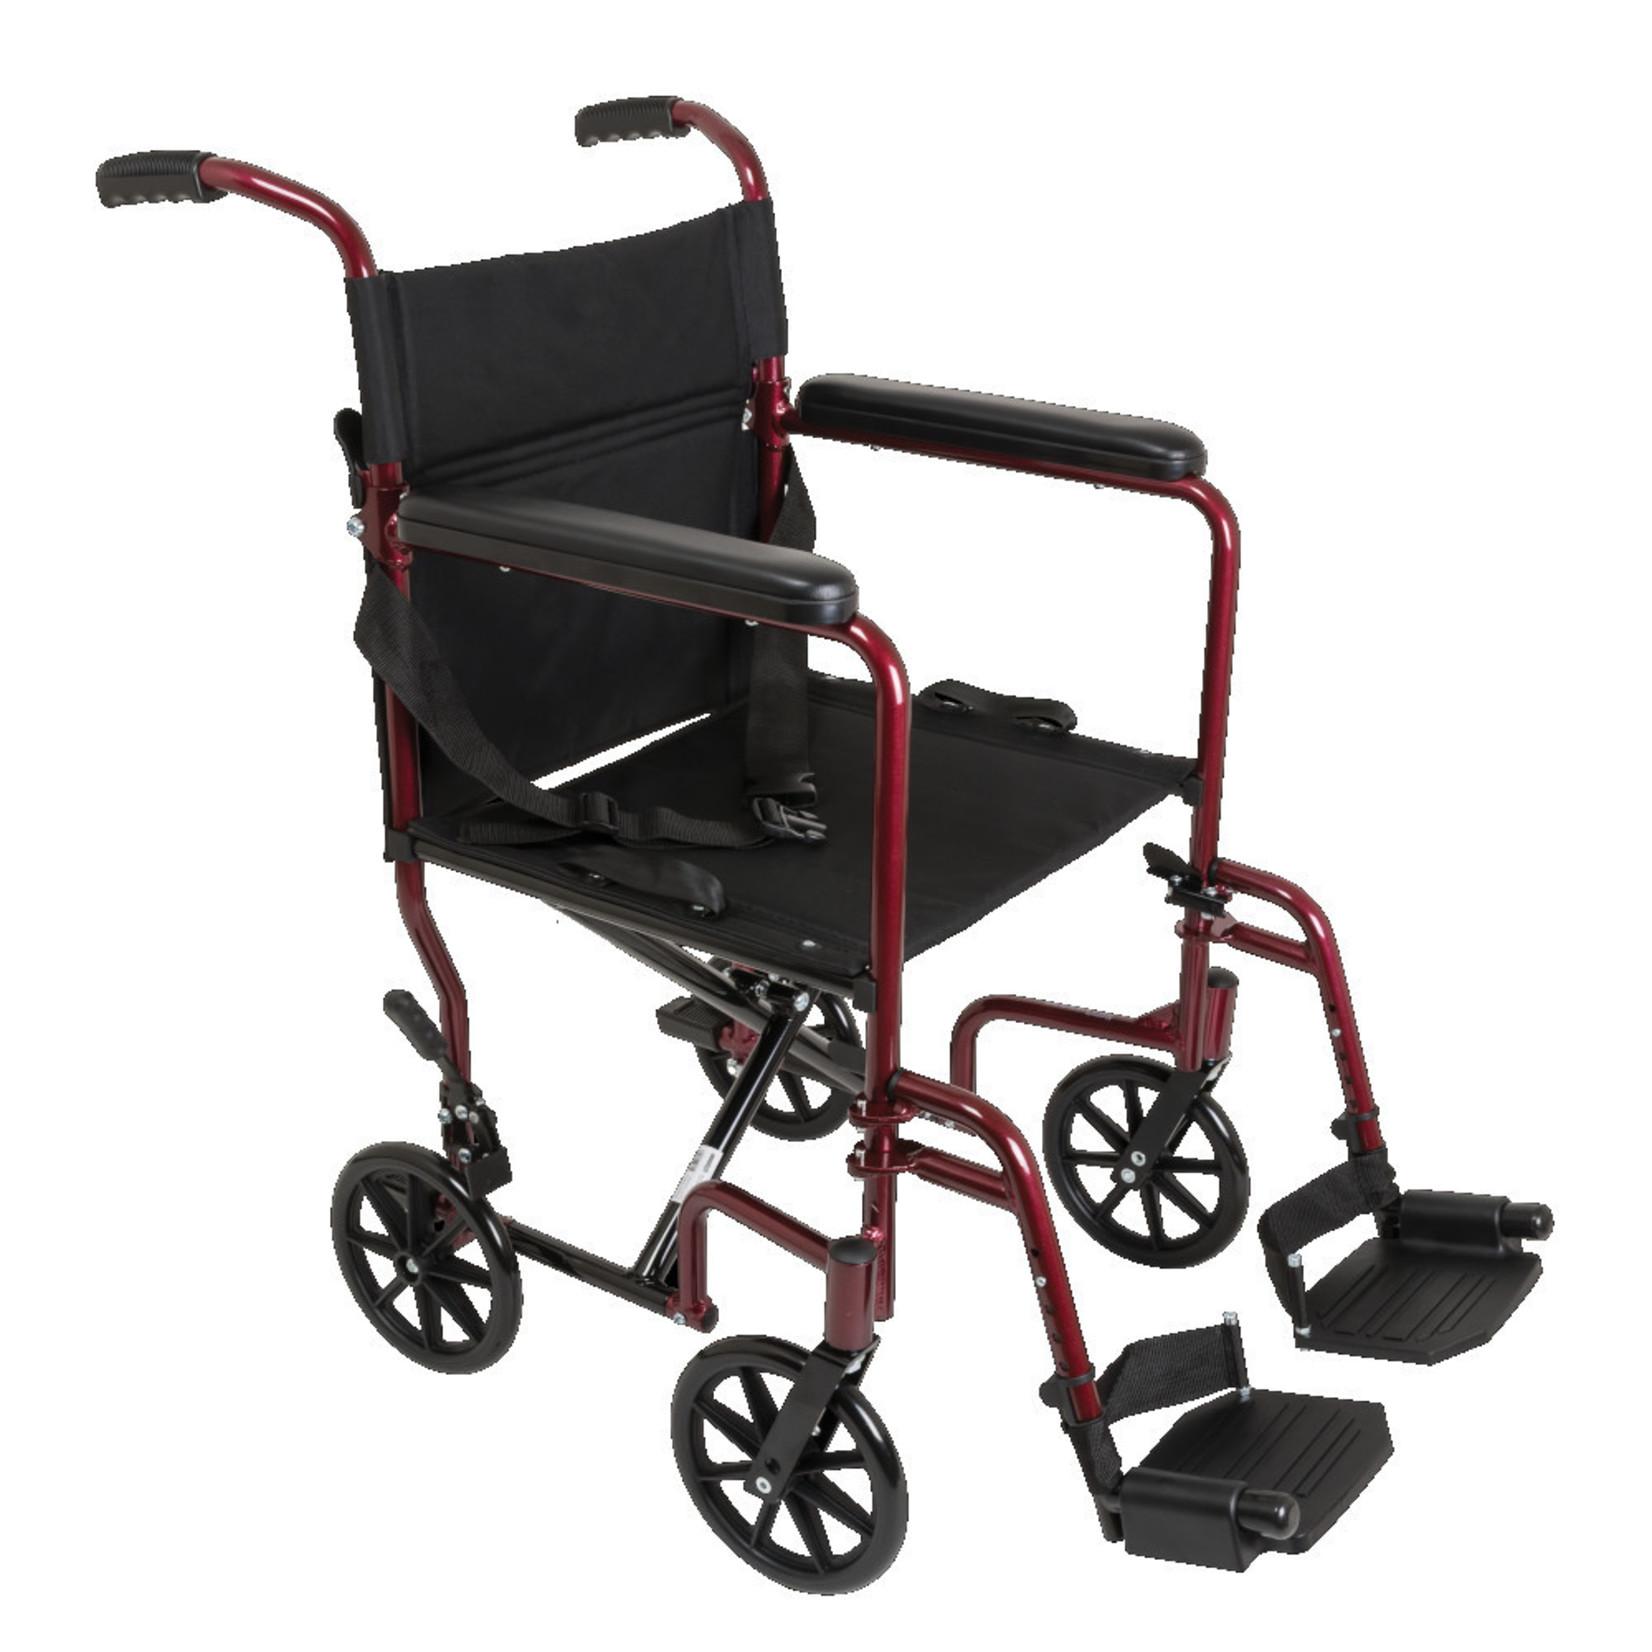 Probasics Transport Chair Aluminum Red